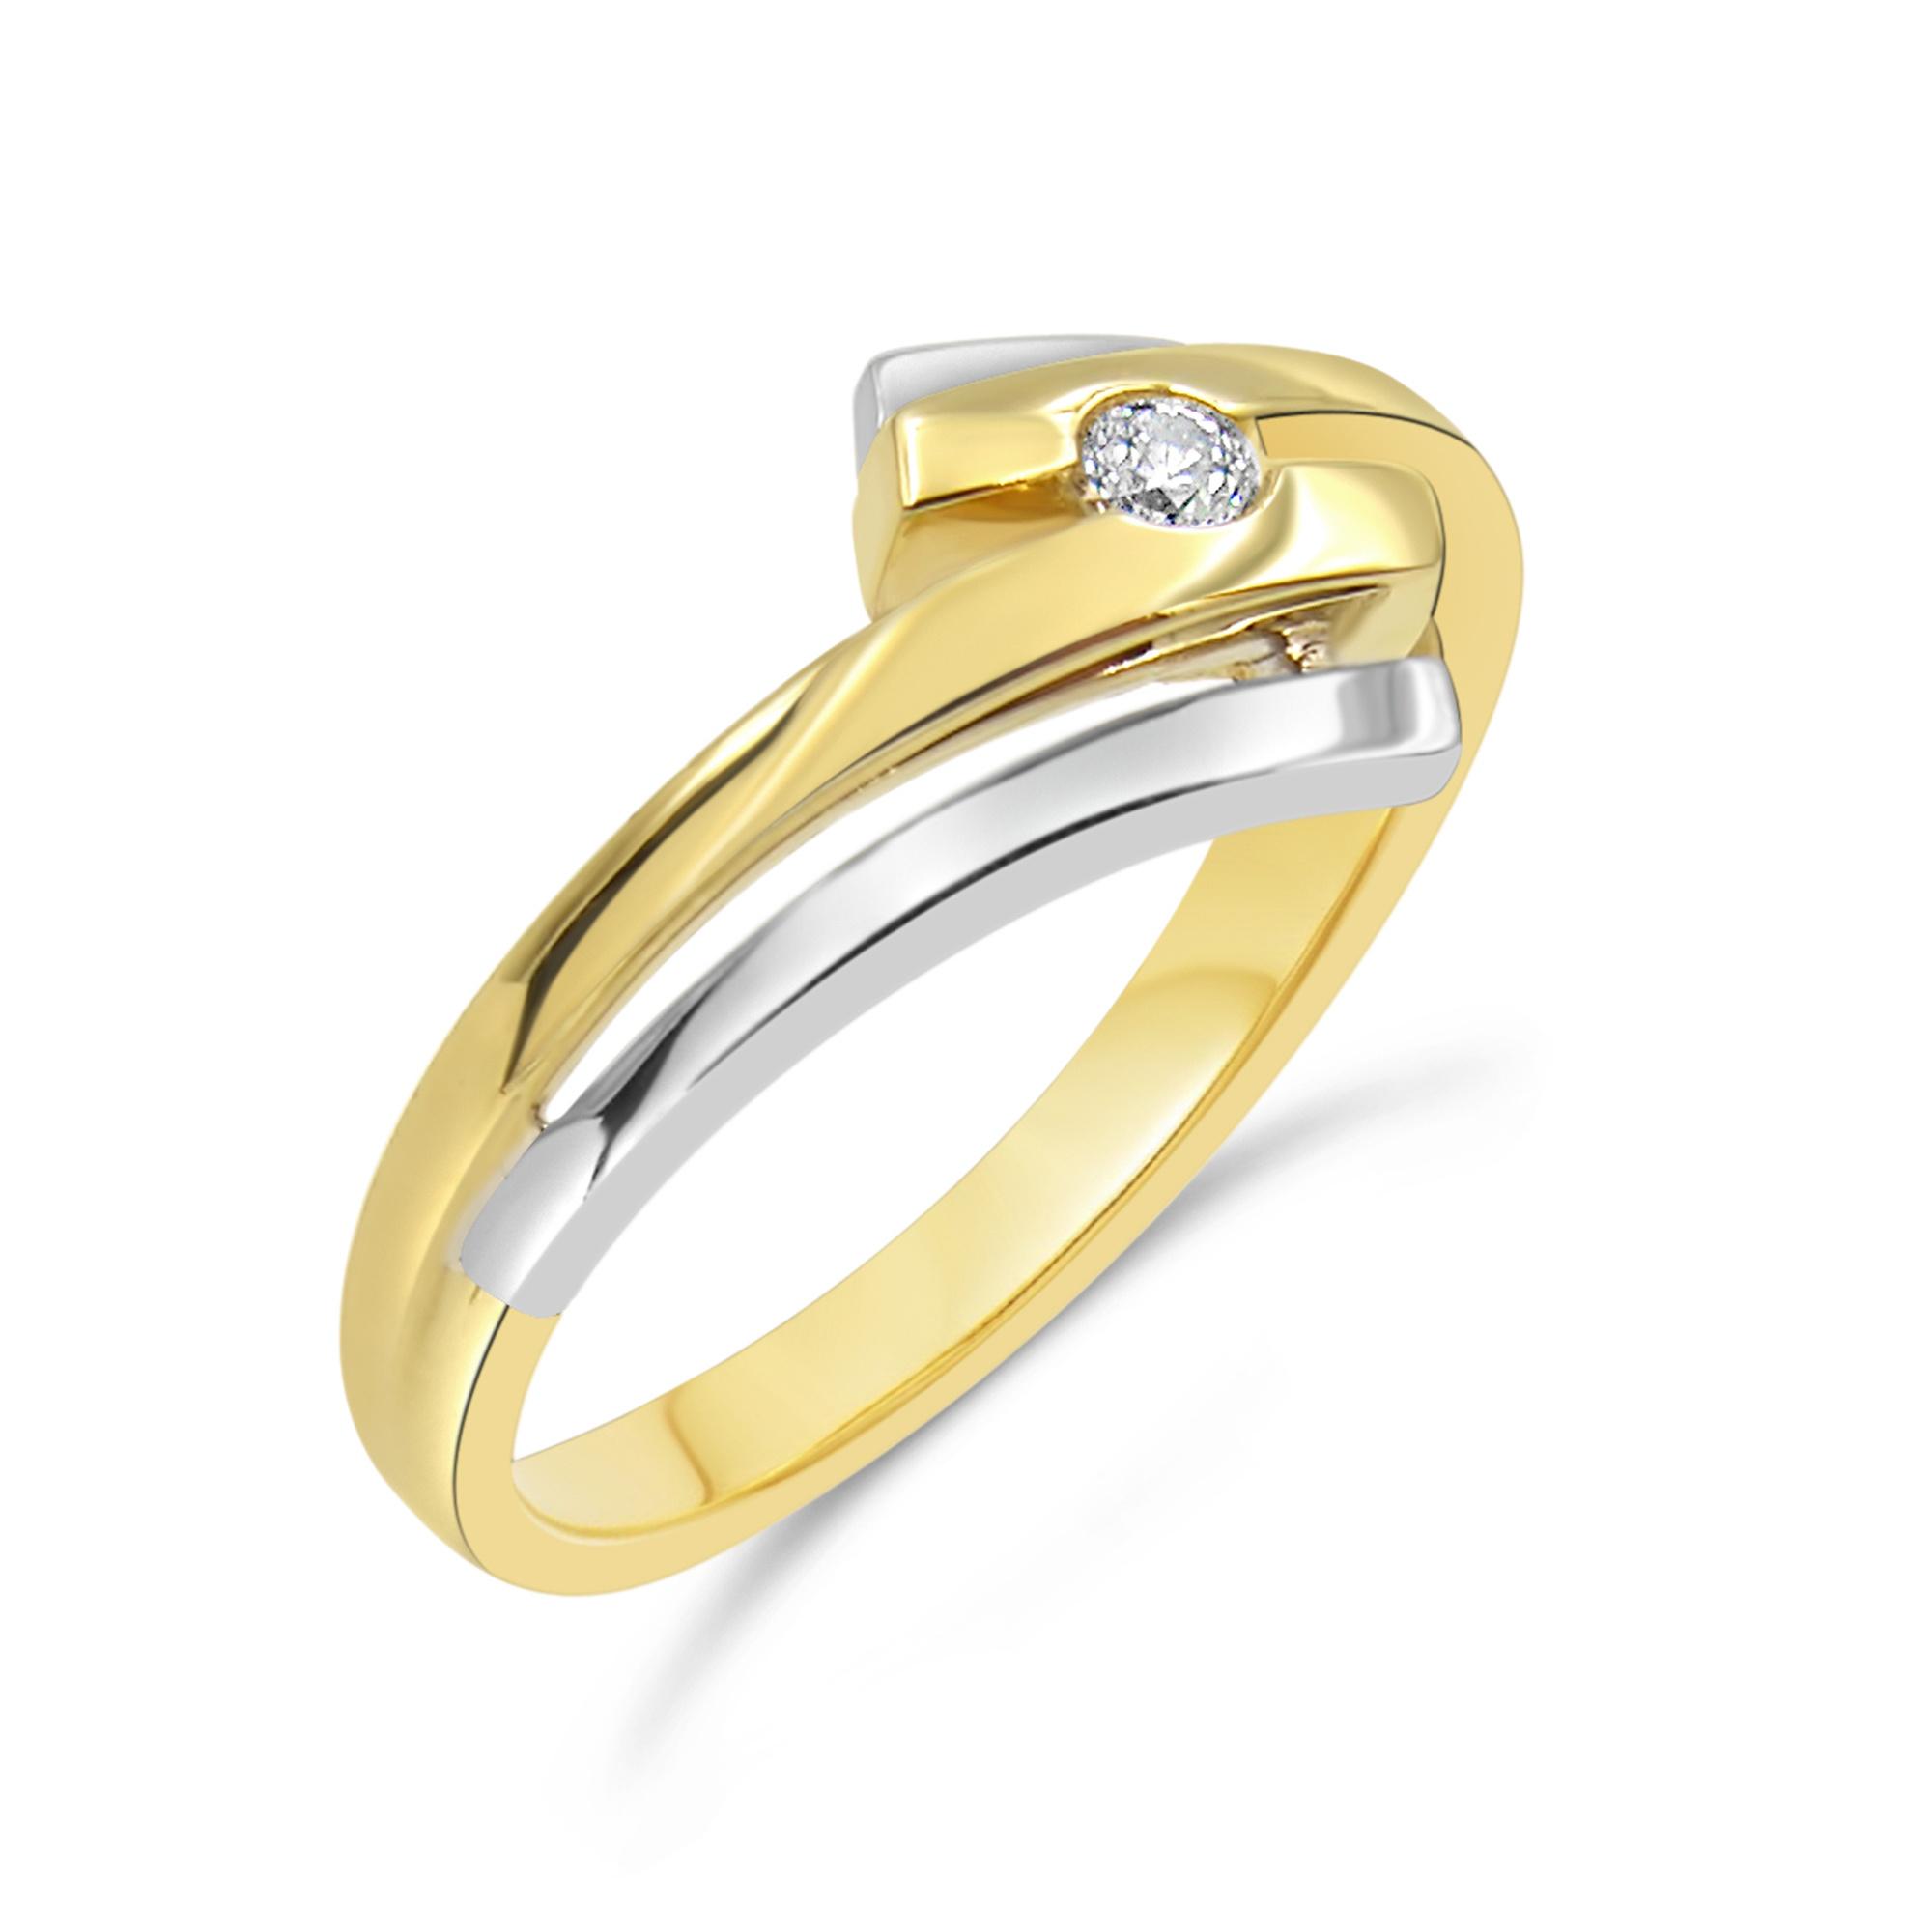 14 karat yellow gold engagement ring with 0.05 ct diamond